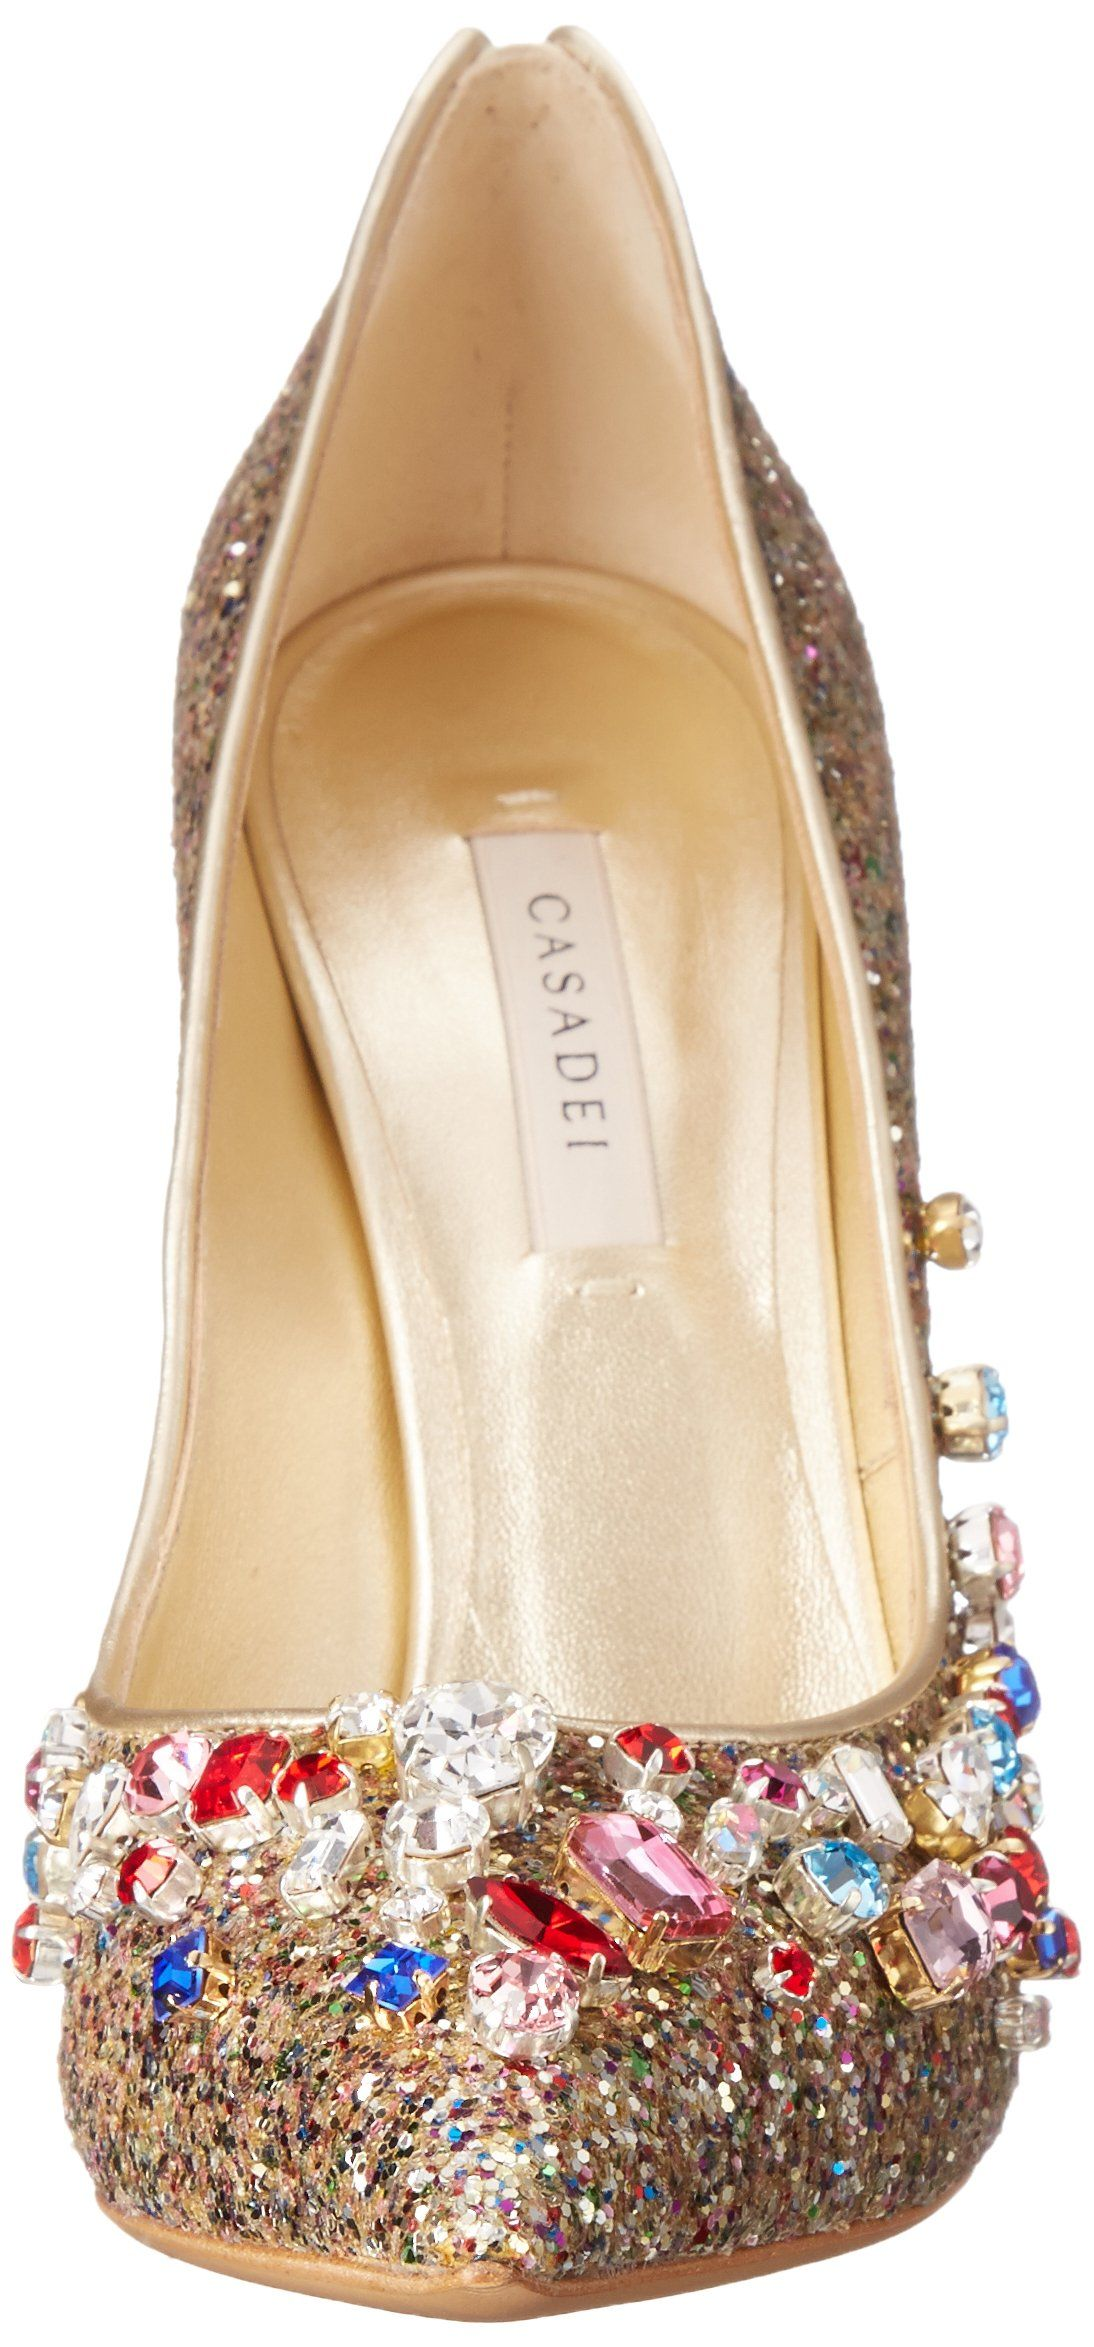 Amazon.com  Casadei Women s 1FG27C115.T677U27 Dress Pump  Shoes ... df2b457ec4e